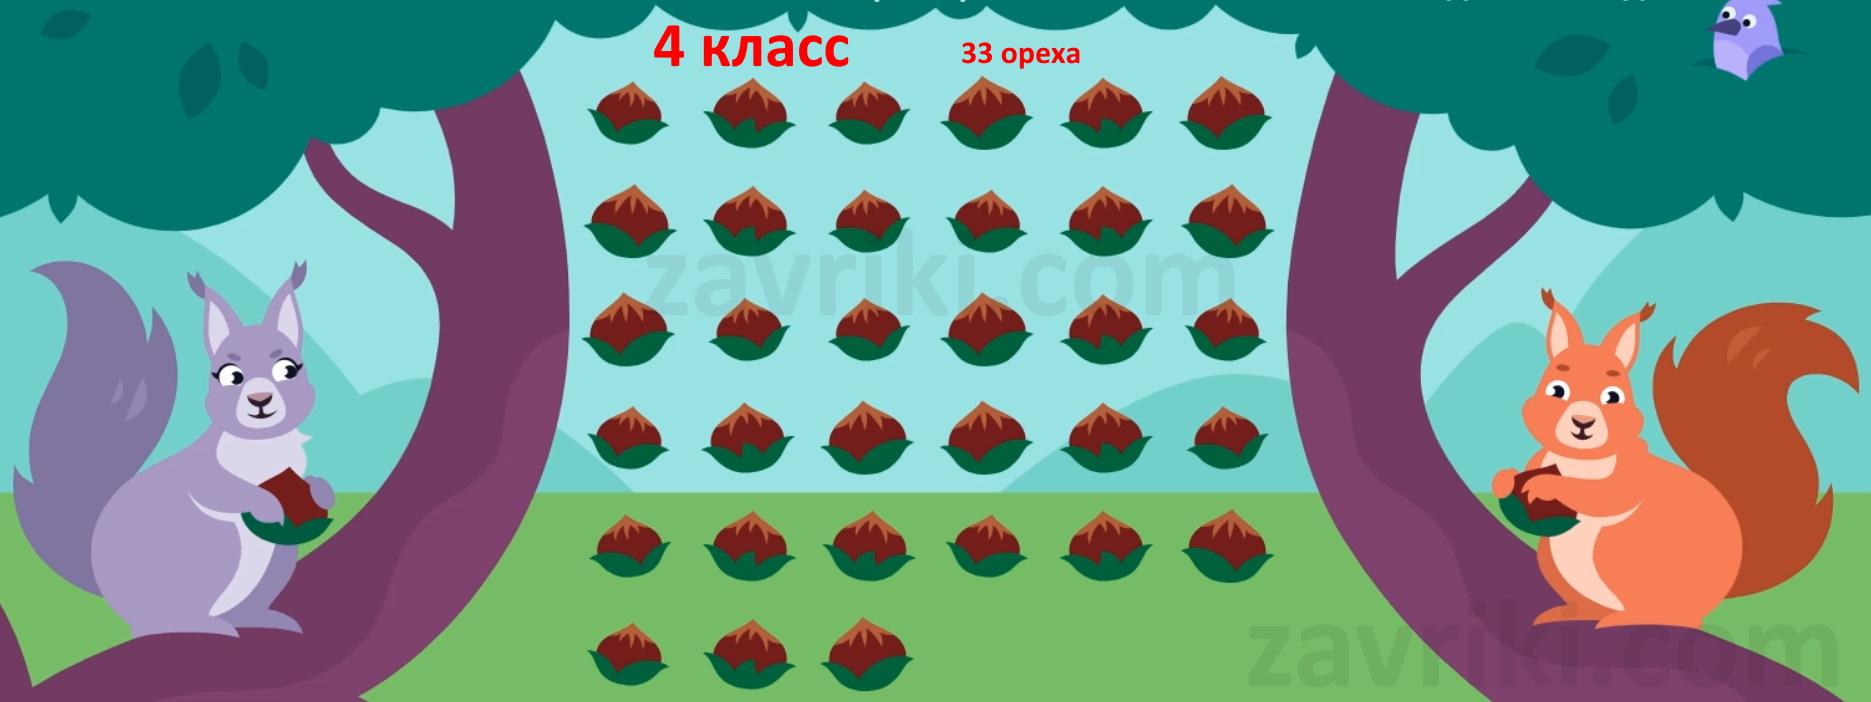 Белки делят орехи 4 класс Учи.ру